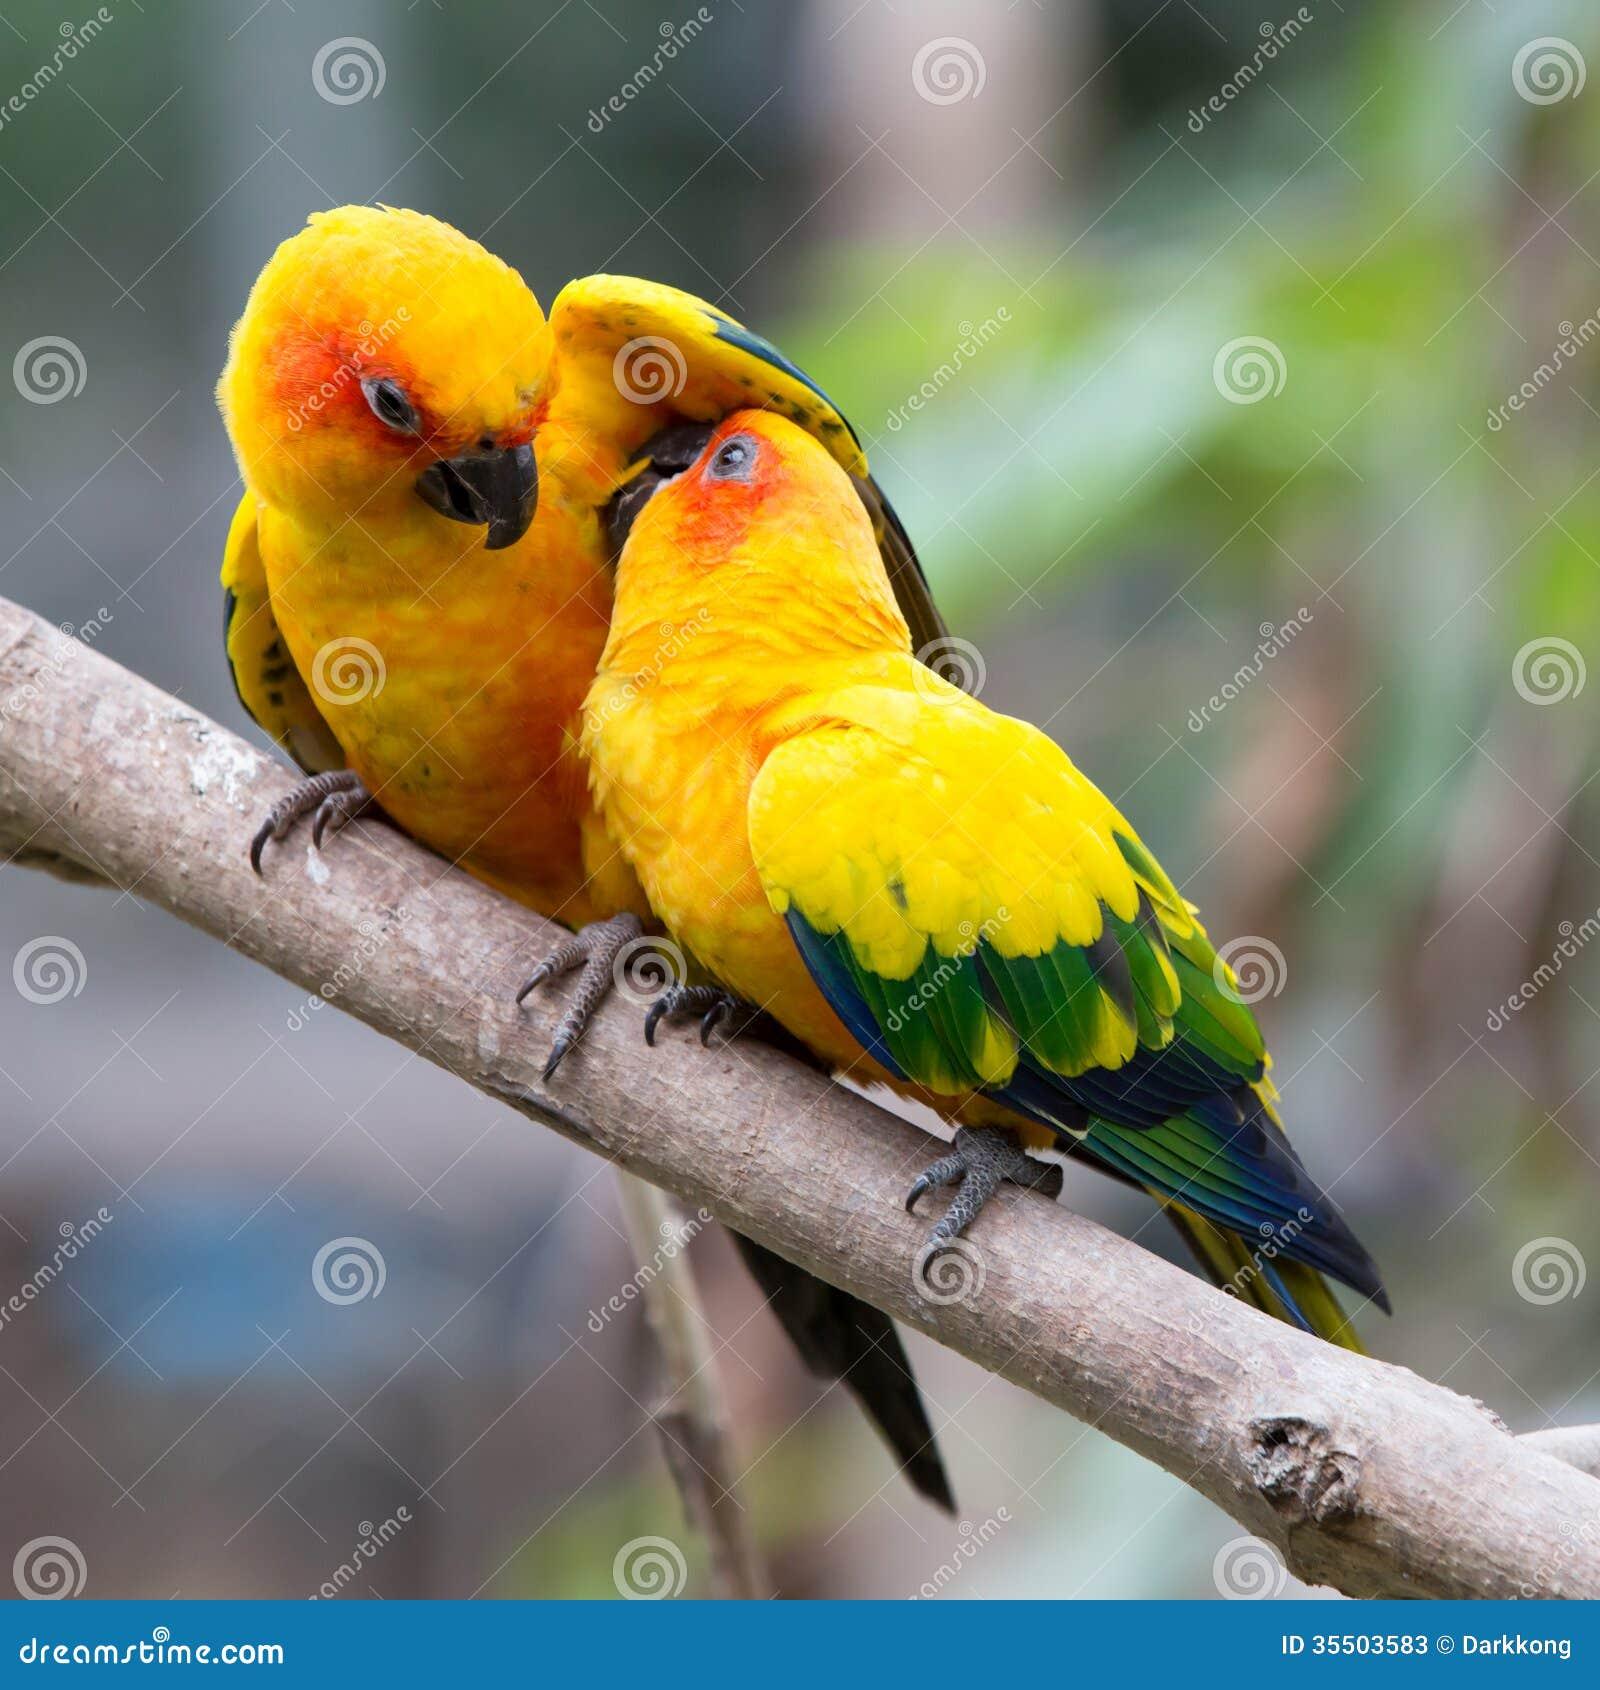 colorful birds stock photos image 35503583